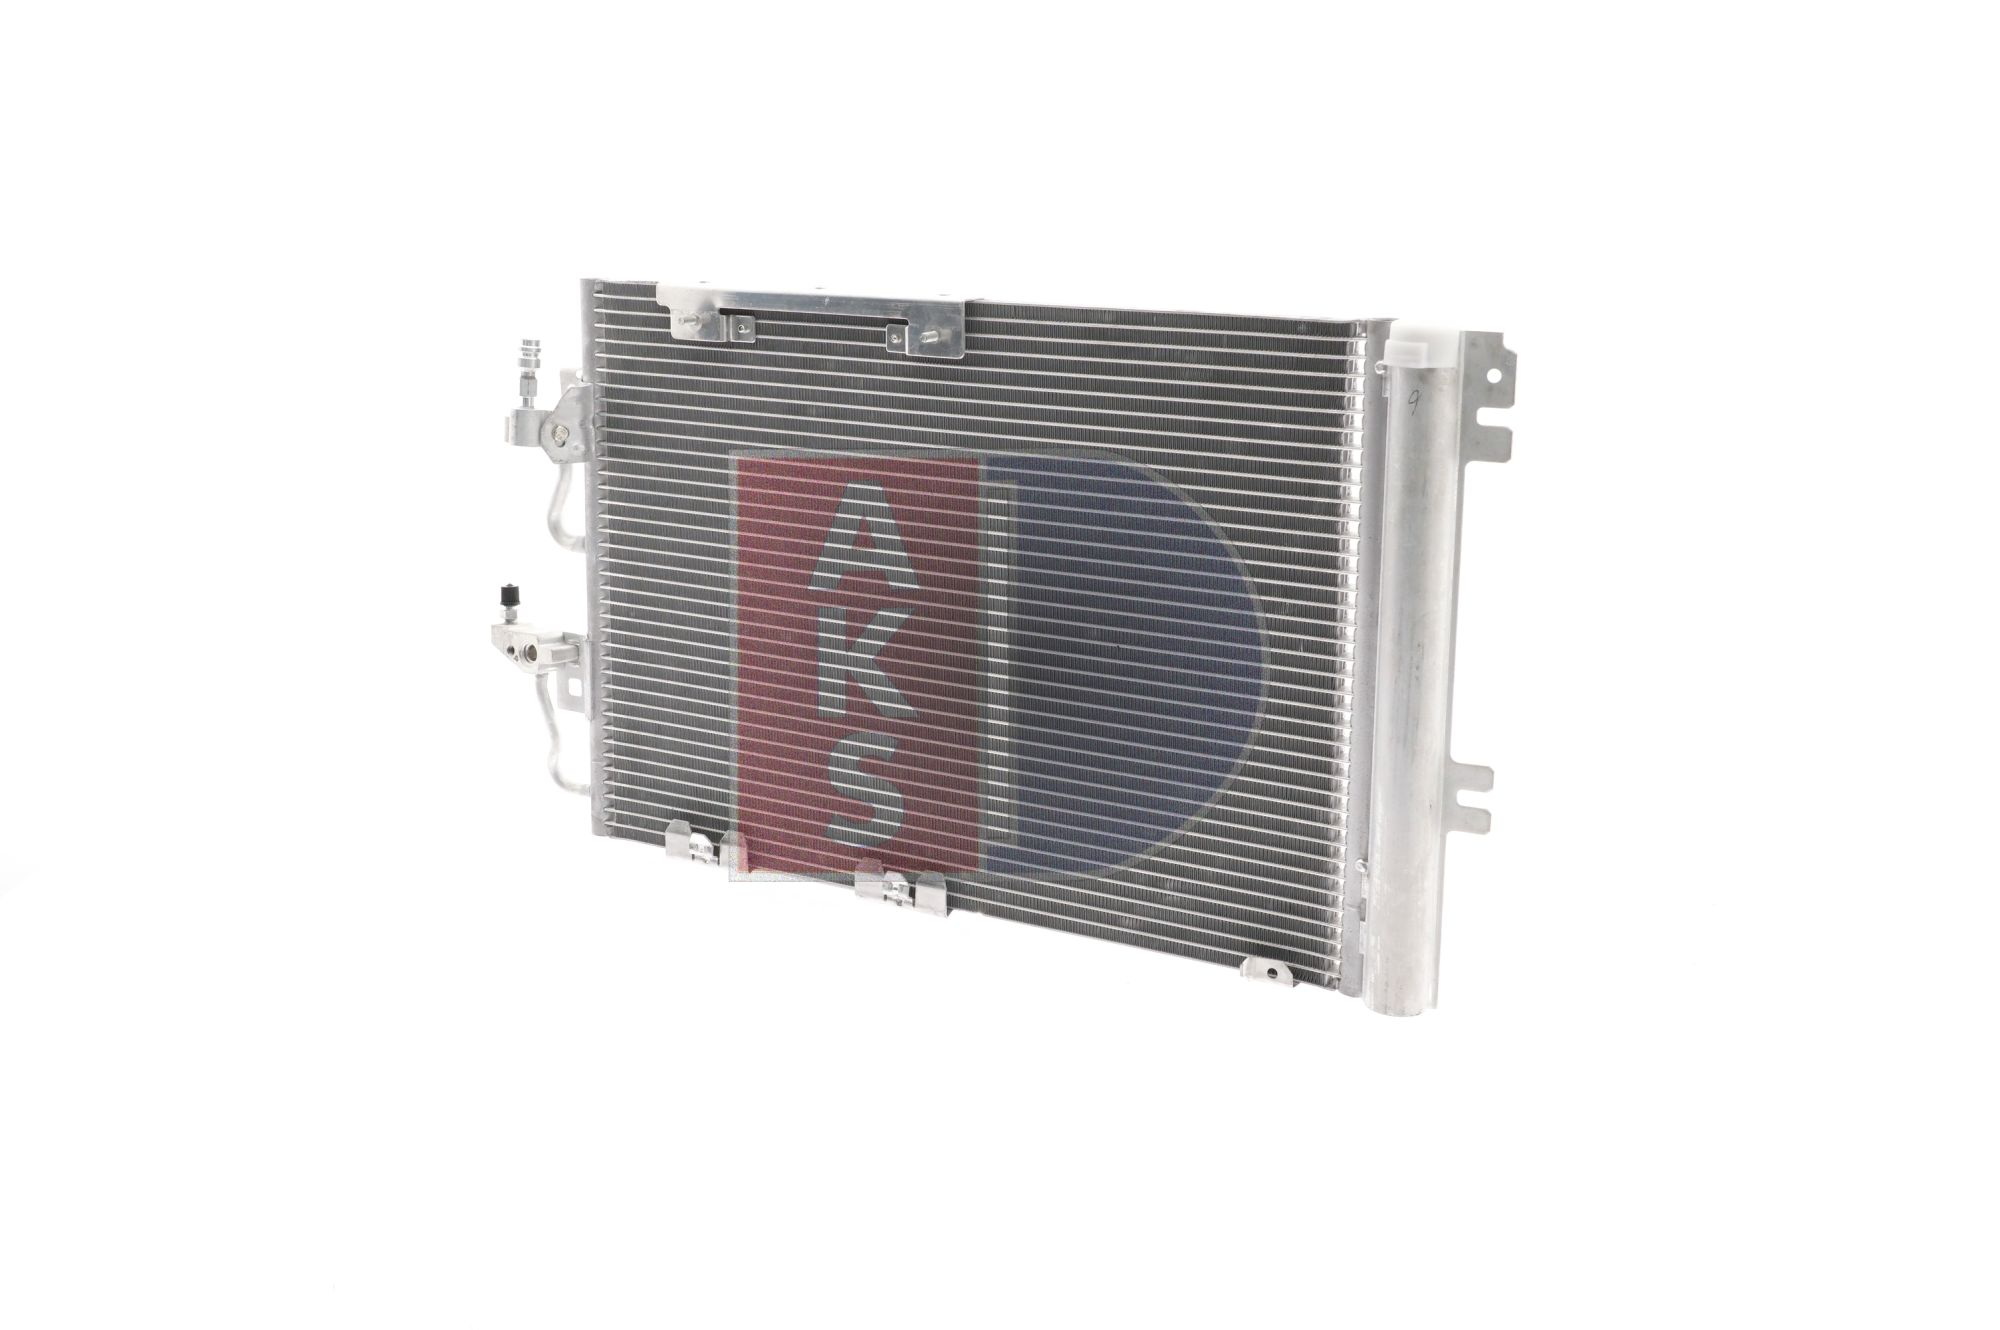 Kondensator AKS DASIS 152015N Bewertung